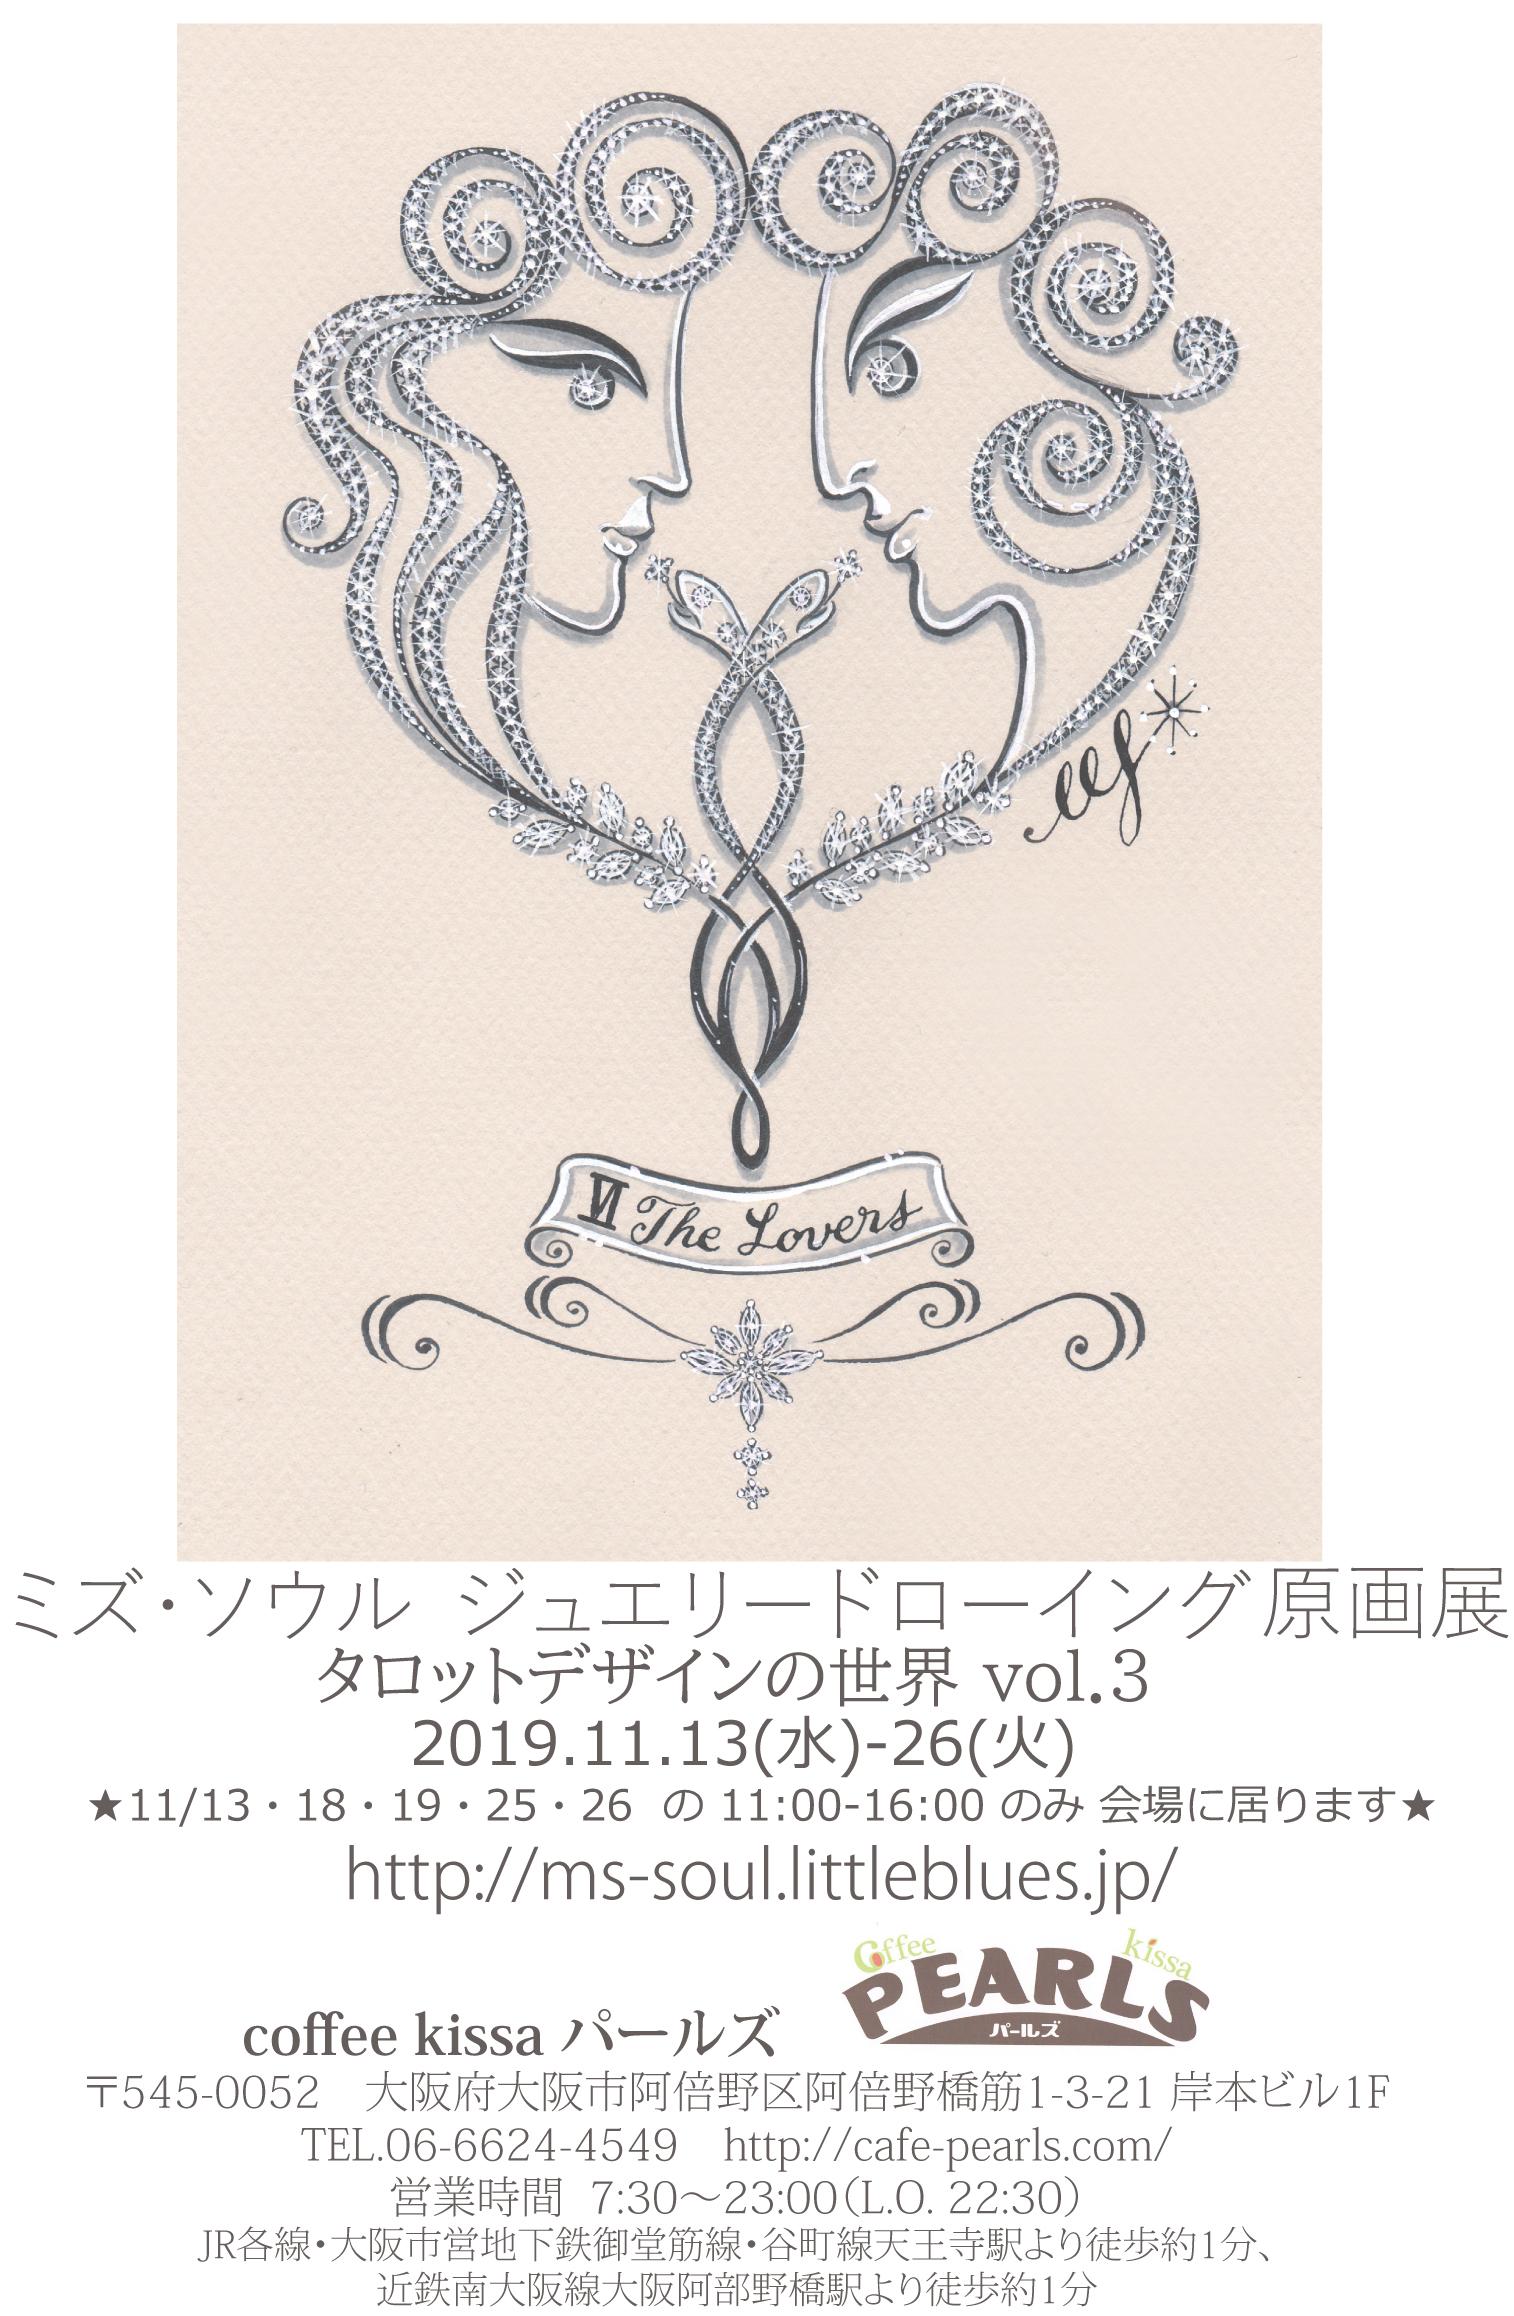 20191113-26mssoul_1